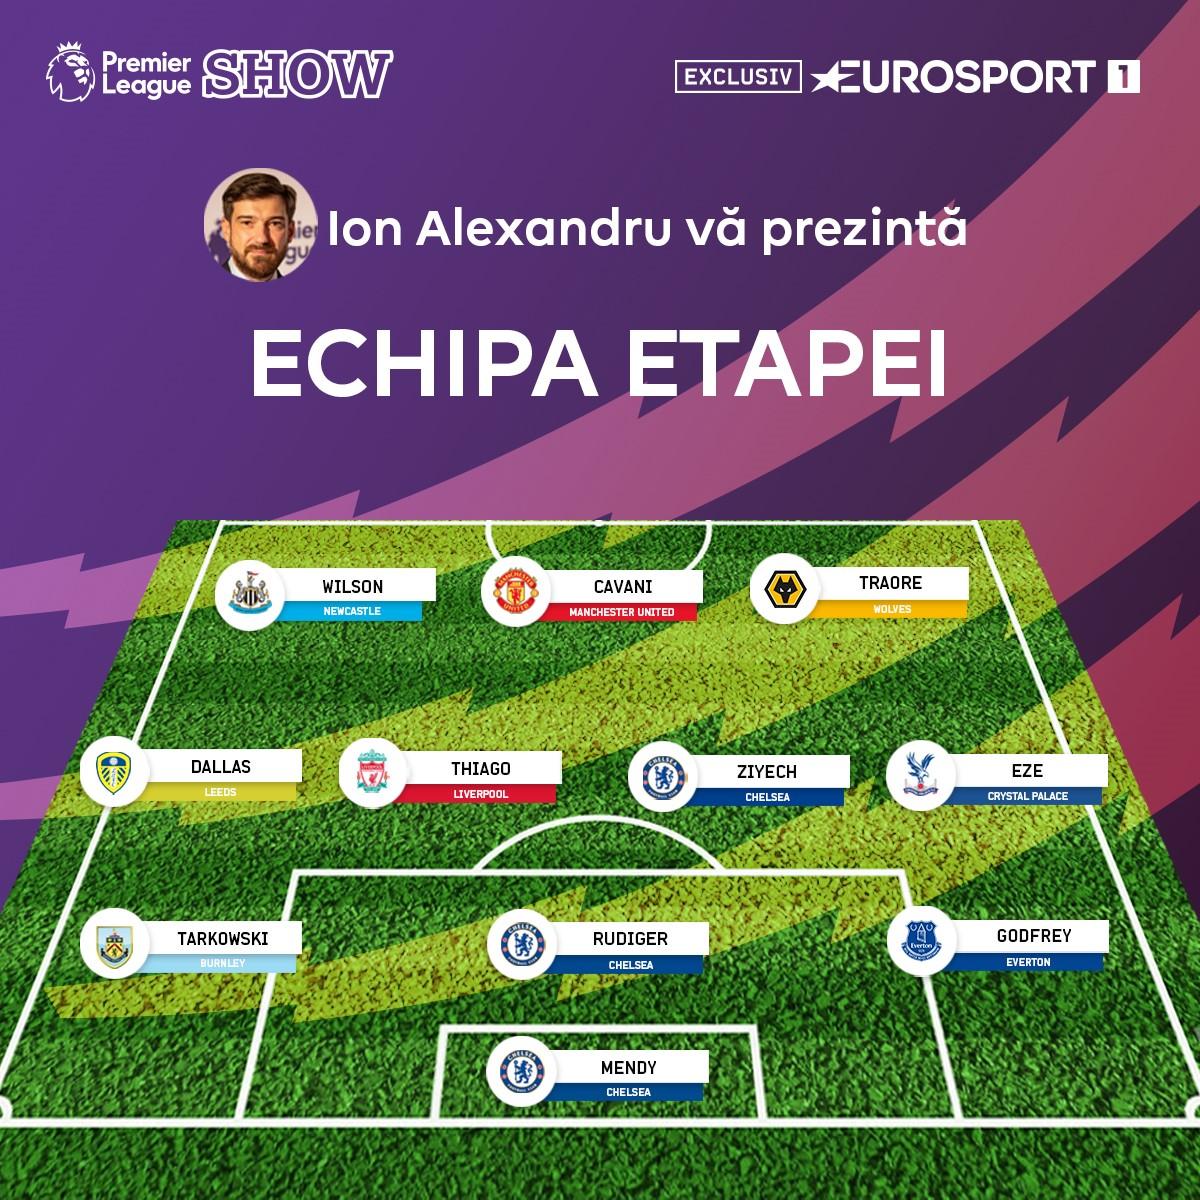 https://i.eurosport.com/2021/05/11/3130110.jpg